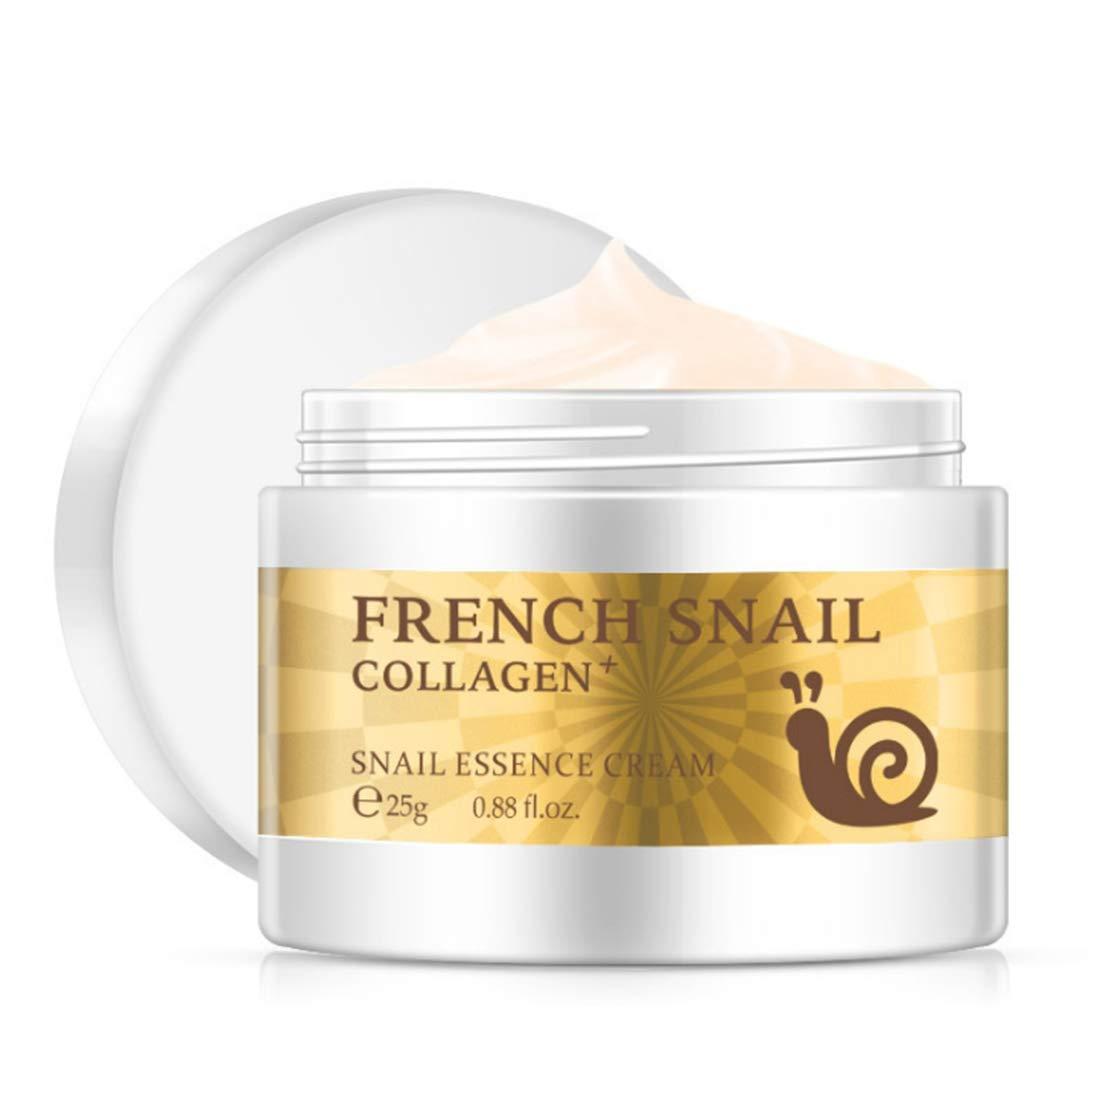 Loweryeah Snail Repair Anti-aging Cream 25g Collagen Moisturizing Nourish Repair Damaged Face Care Hyaluronic Acid Cream